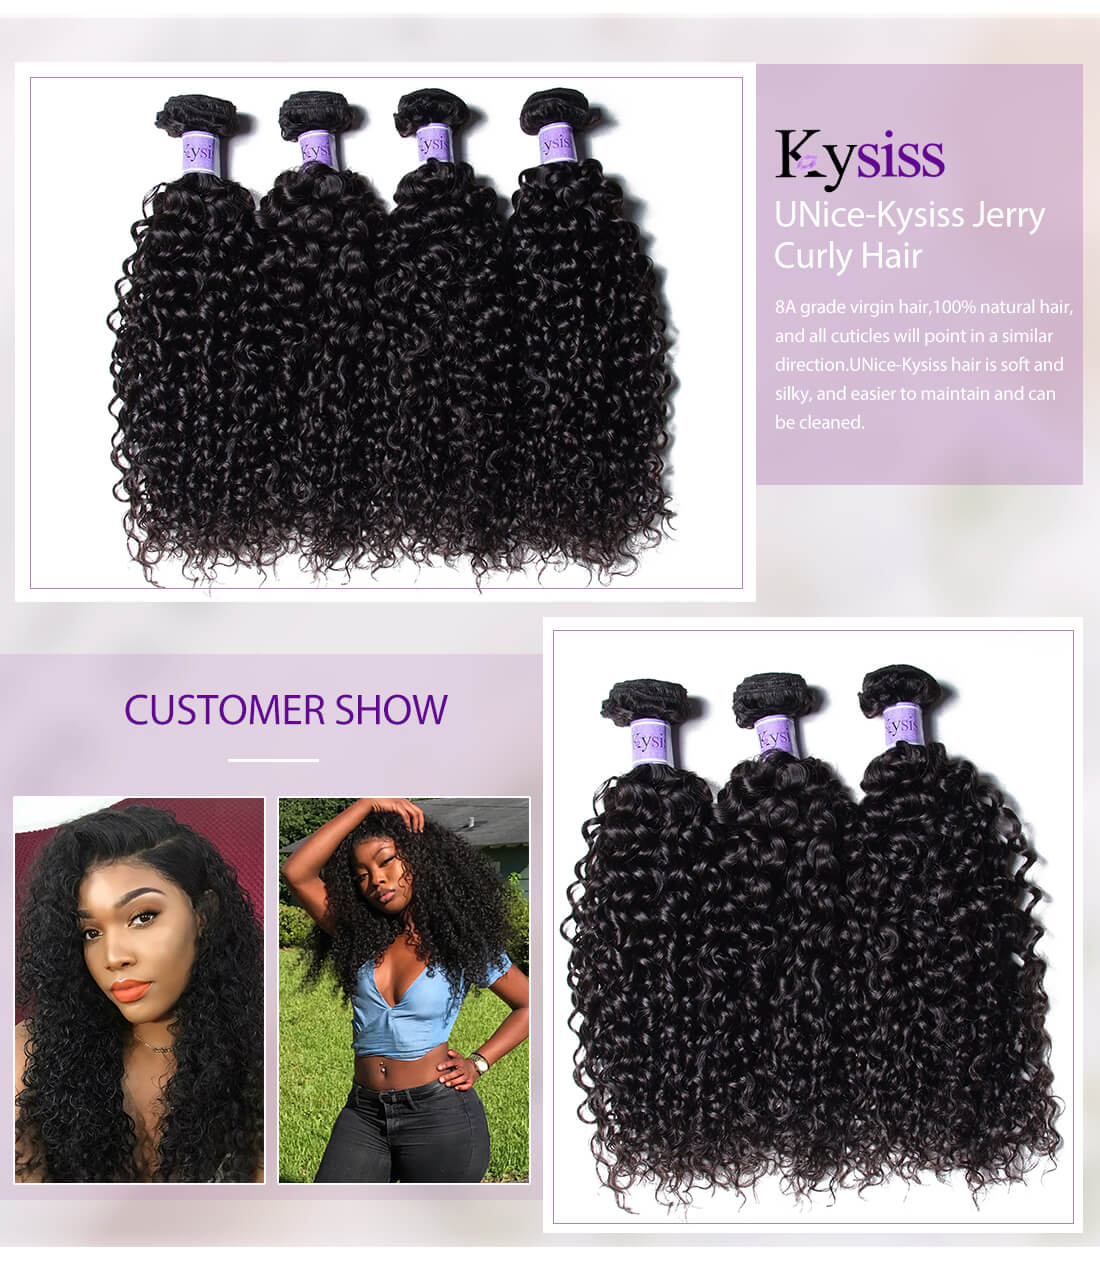 UNice Hair Kysiss Series Jerry Curly Hair